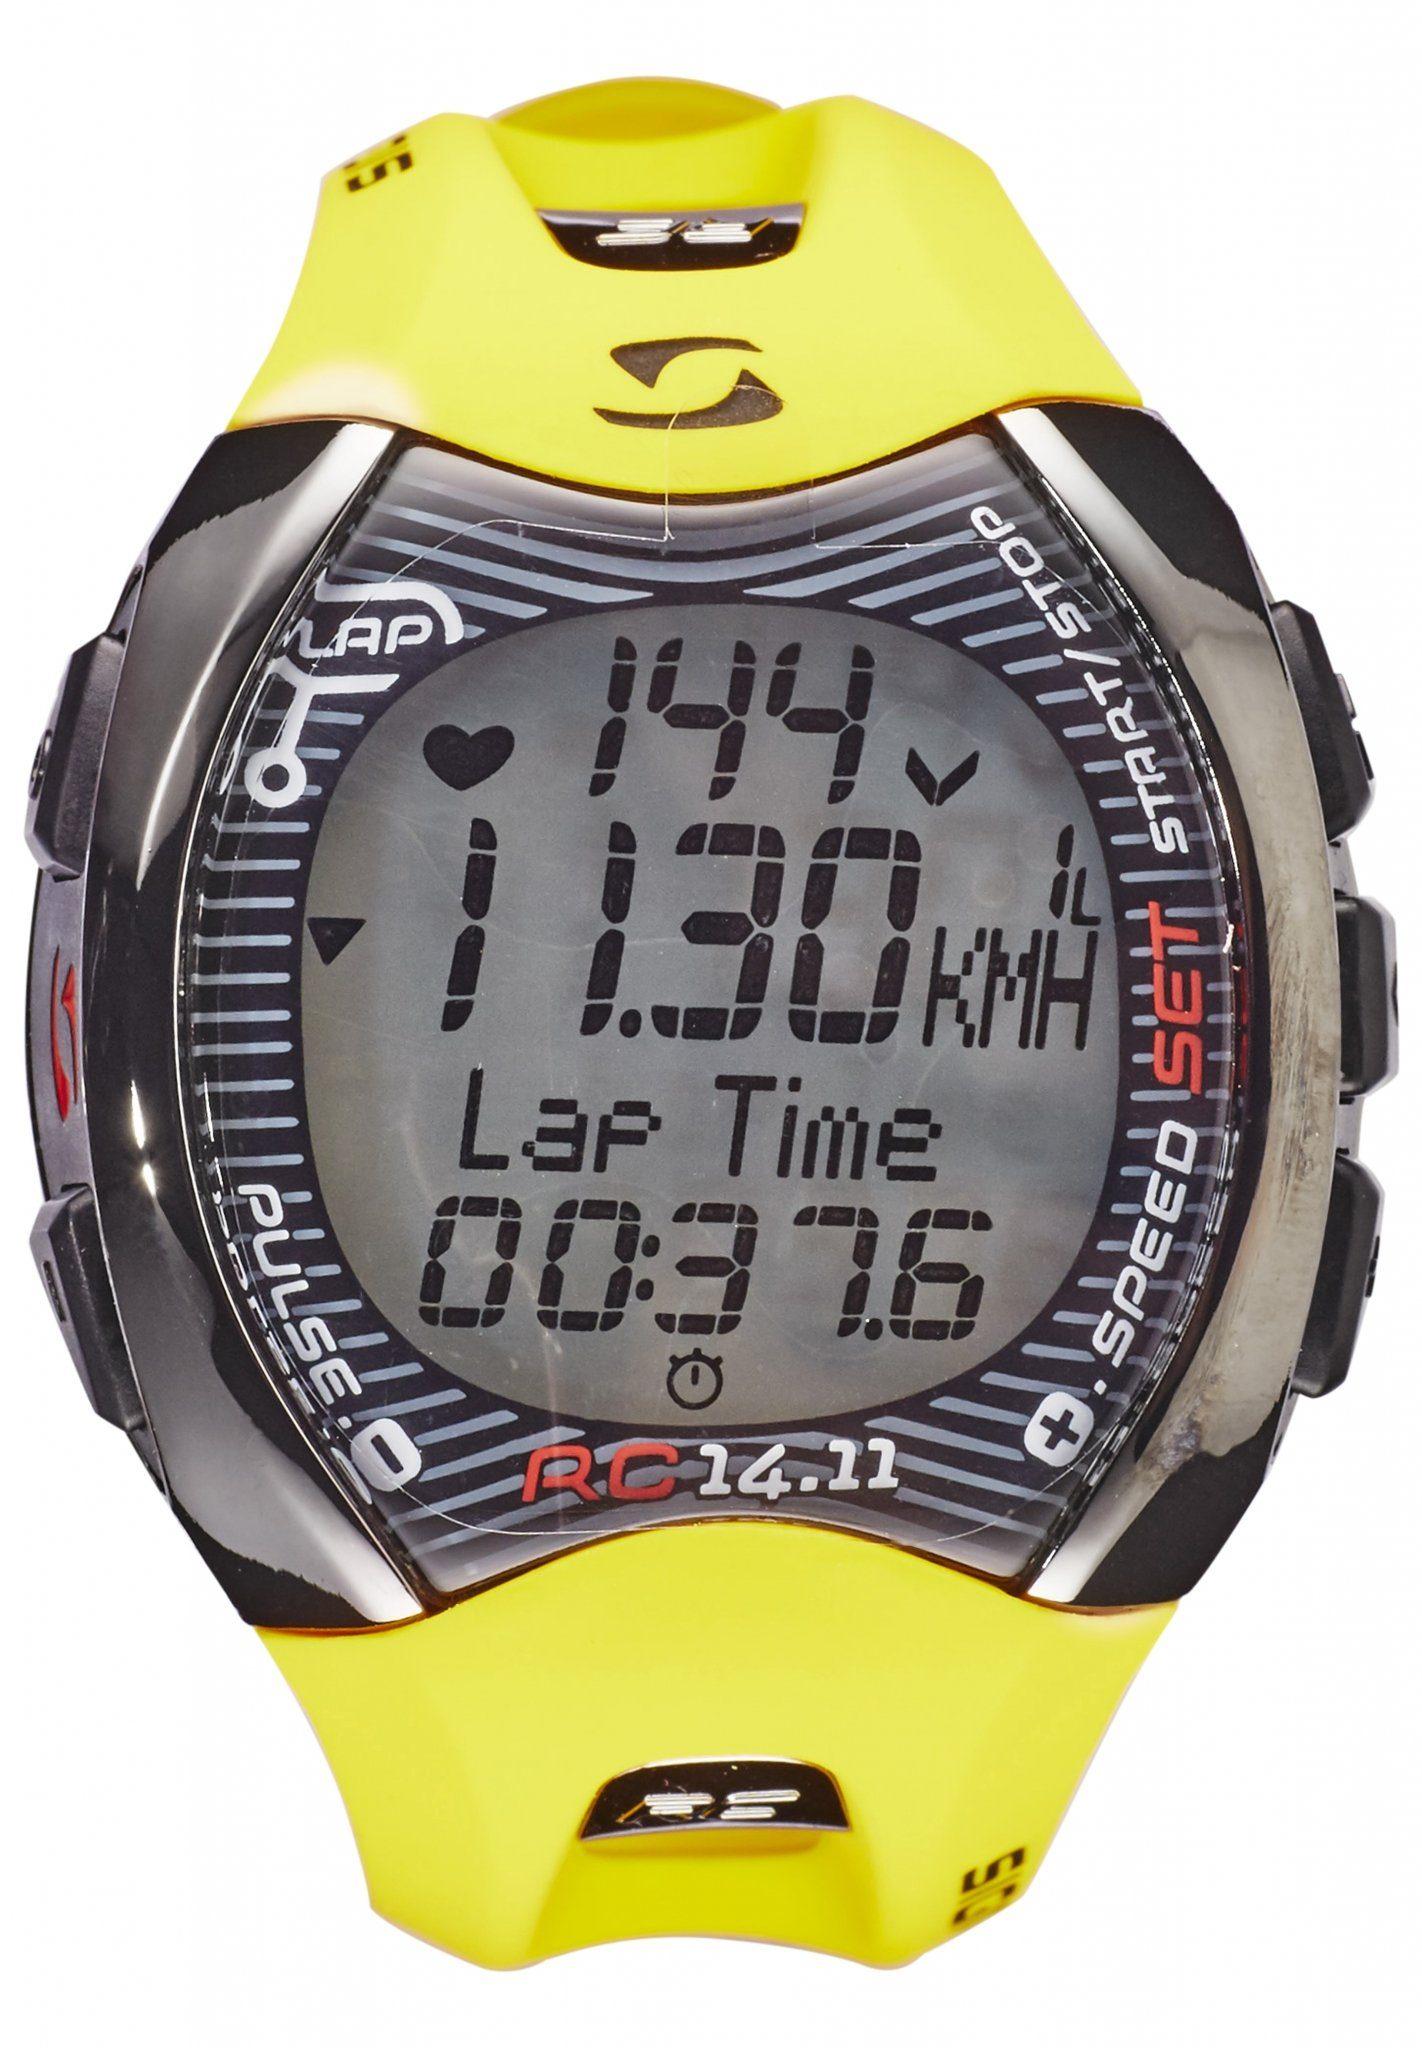 Sigma Sport Fitnesstracker »RC 14.11 Laufuhr«